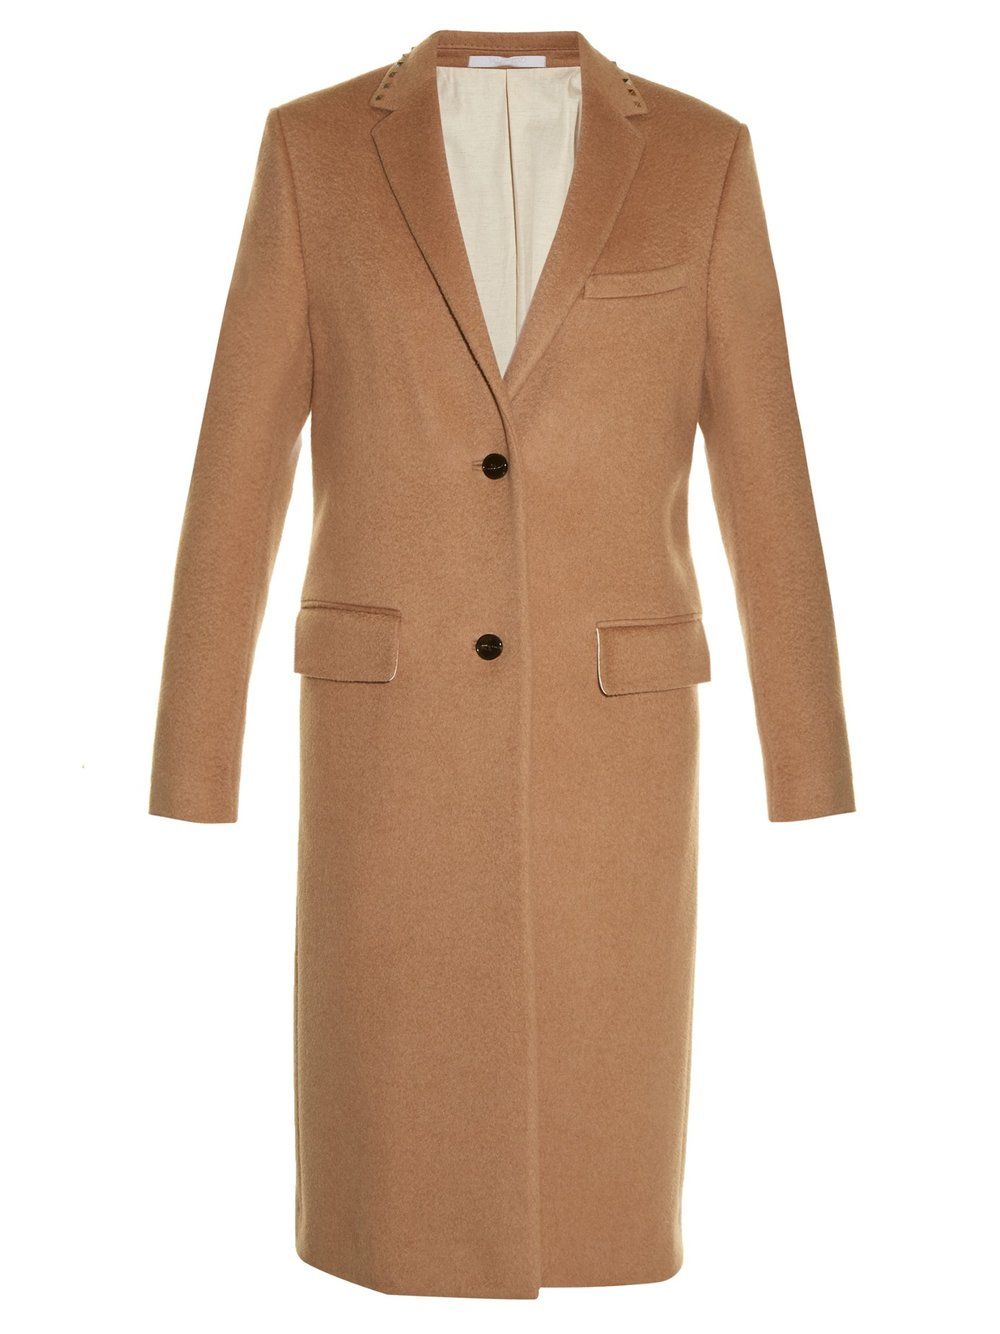 Valentino Rockstud Untitled #10 notch-lapel coat $8,000